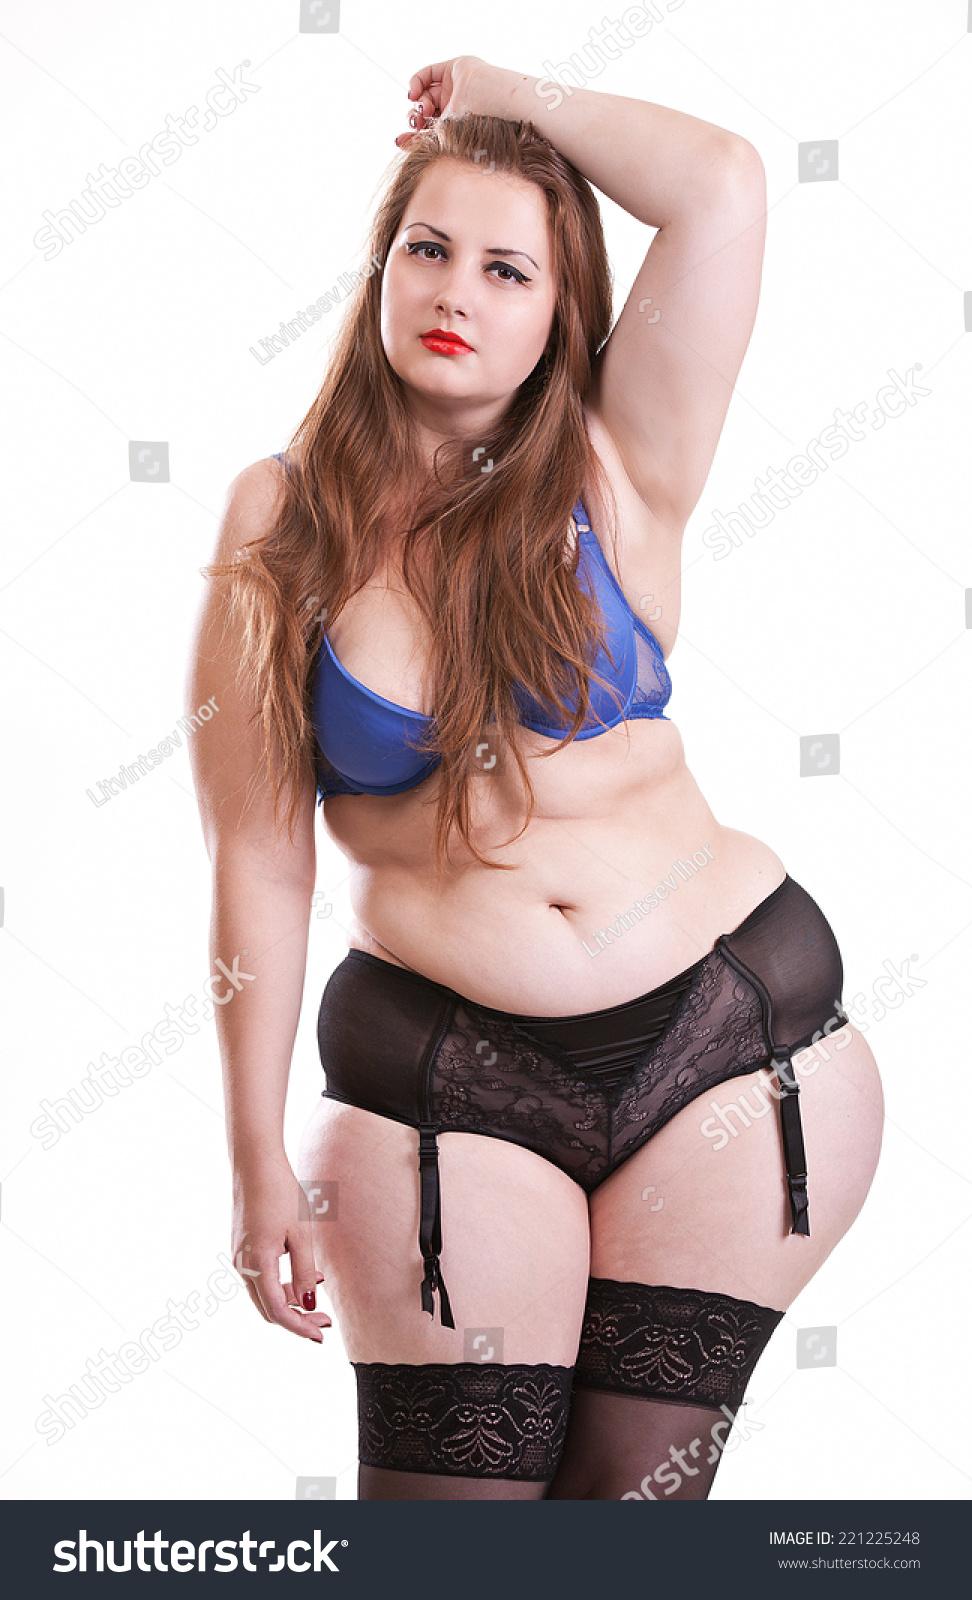 wide-hips-desi-nude